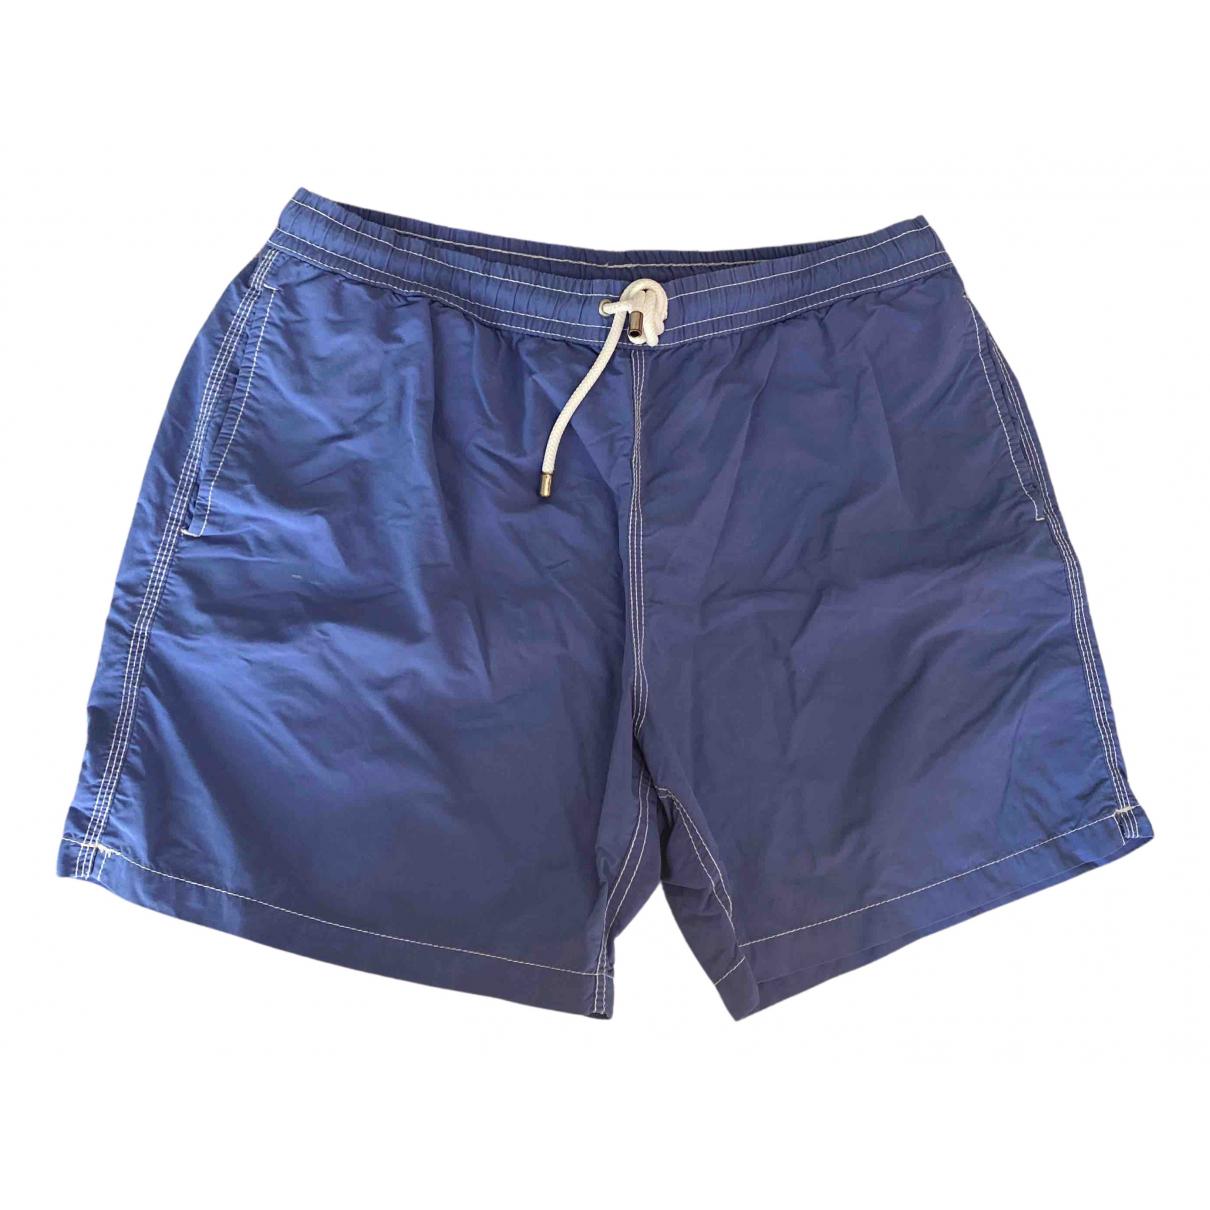 Hartford \N Badeanzug in  Blau Baumwolle - Elasthan